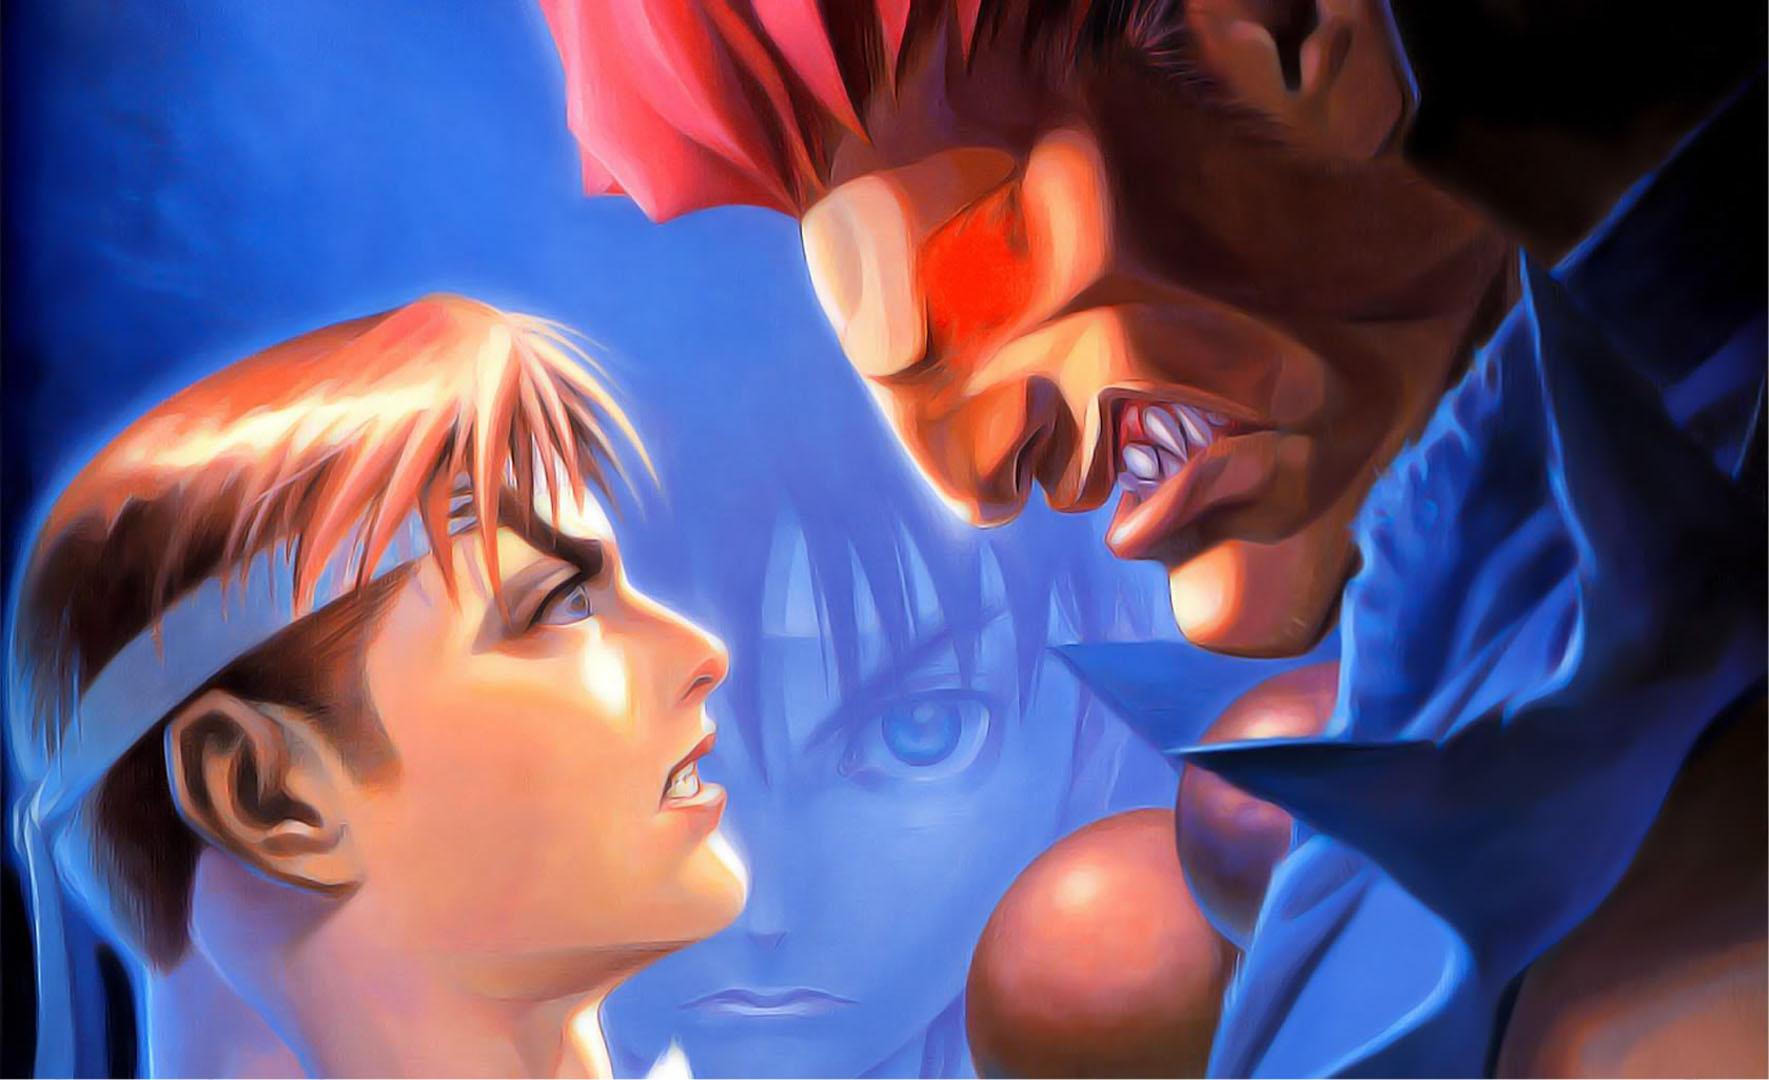 Ryu Vs Akuma Super Street Fighter 4 Wallpaper